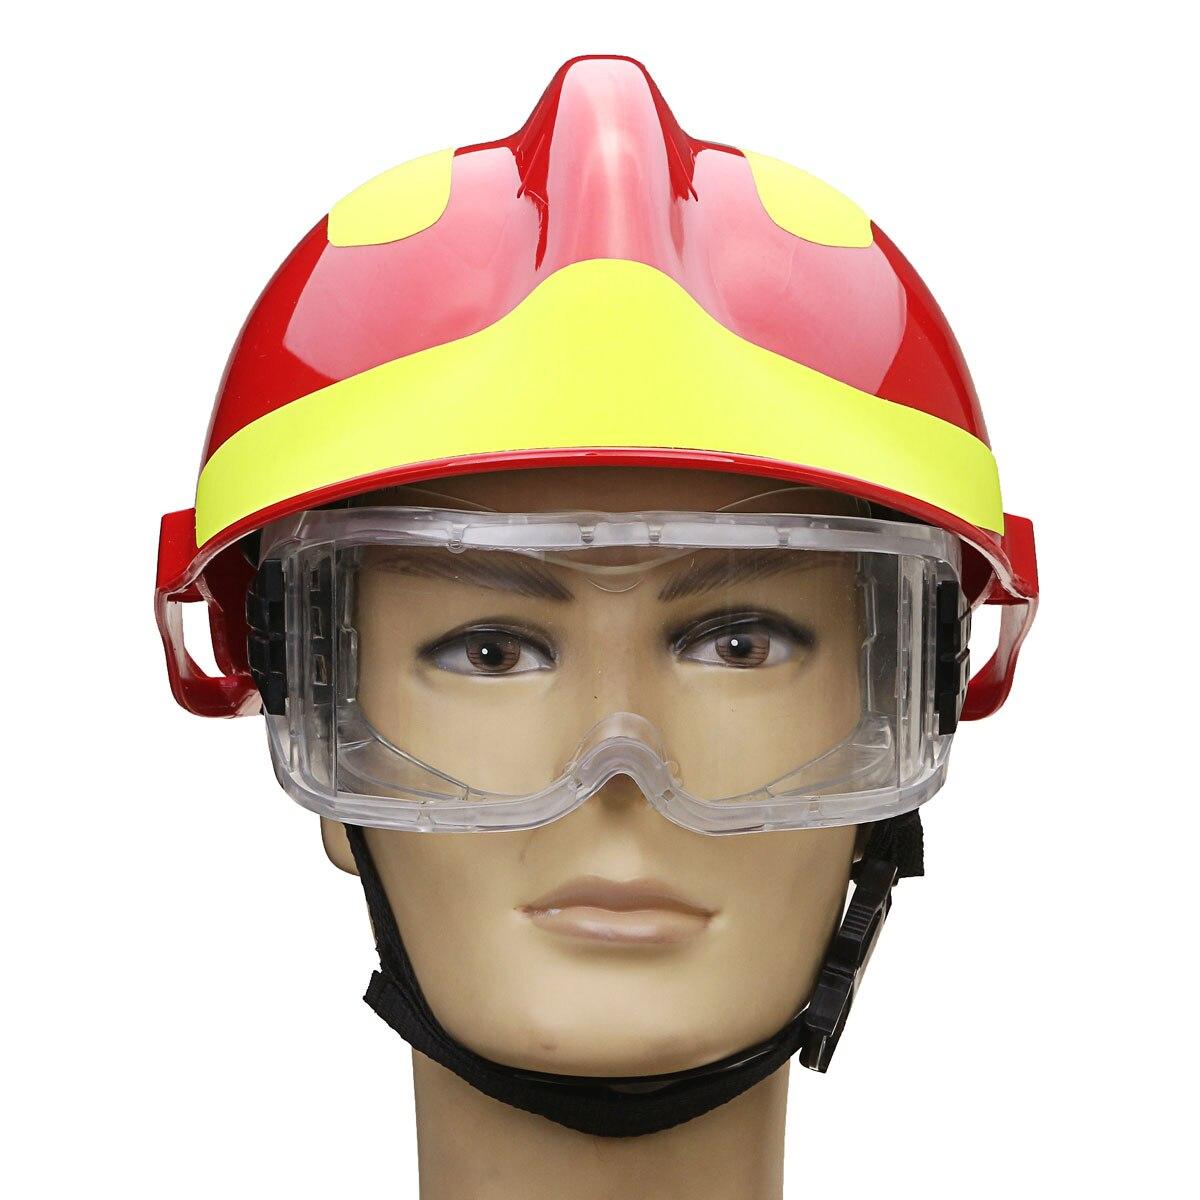 Nueva seguro casco rescate bomberos protectora Gafas Seguridad protector lugar Seguridad Protección contra incendios 53 cm-63 cm